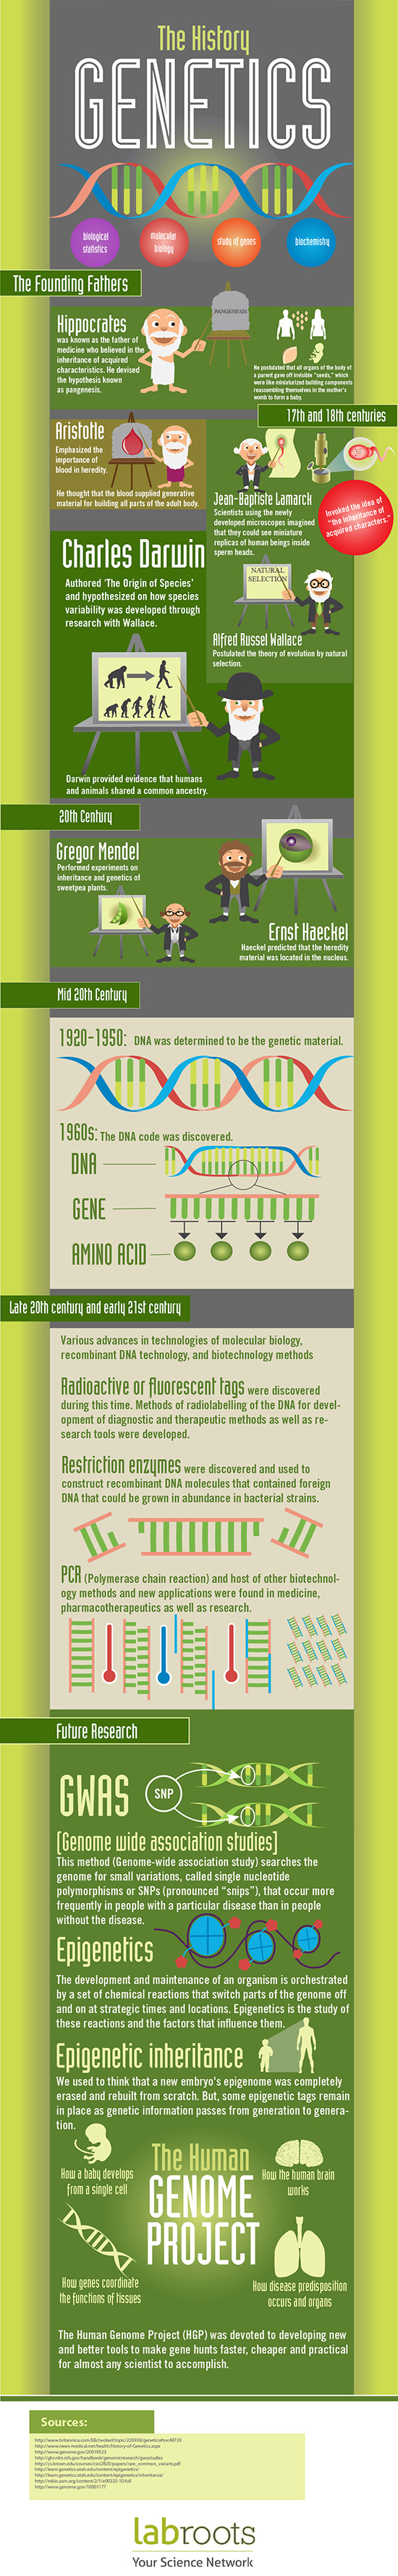 The History Of Genetics